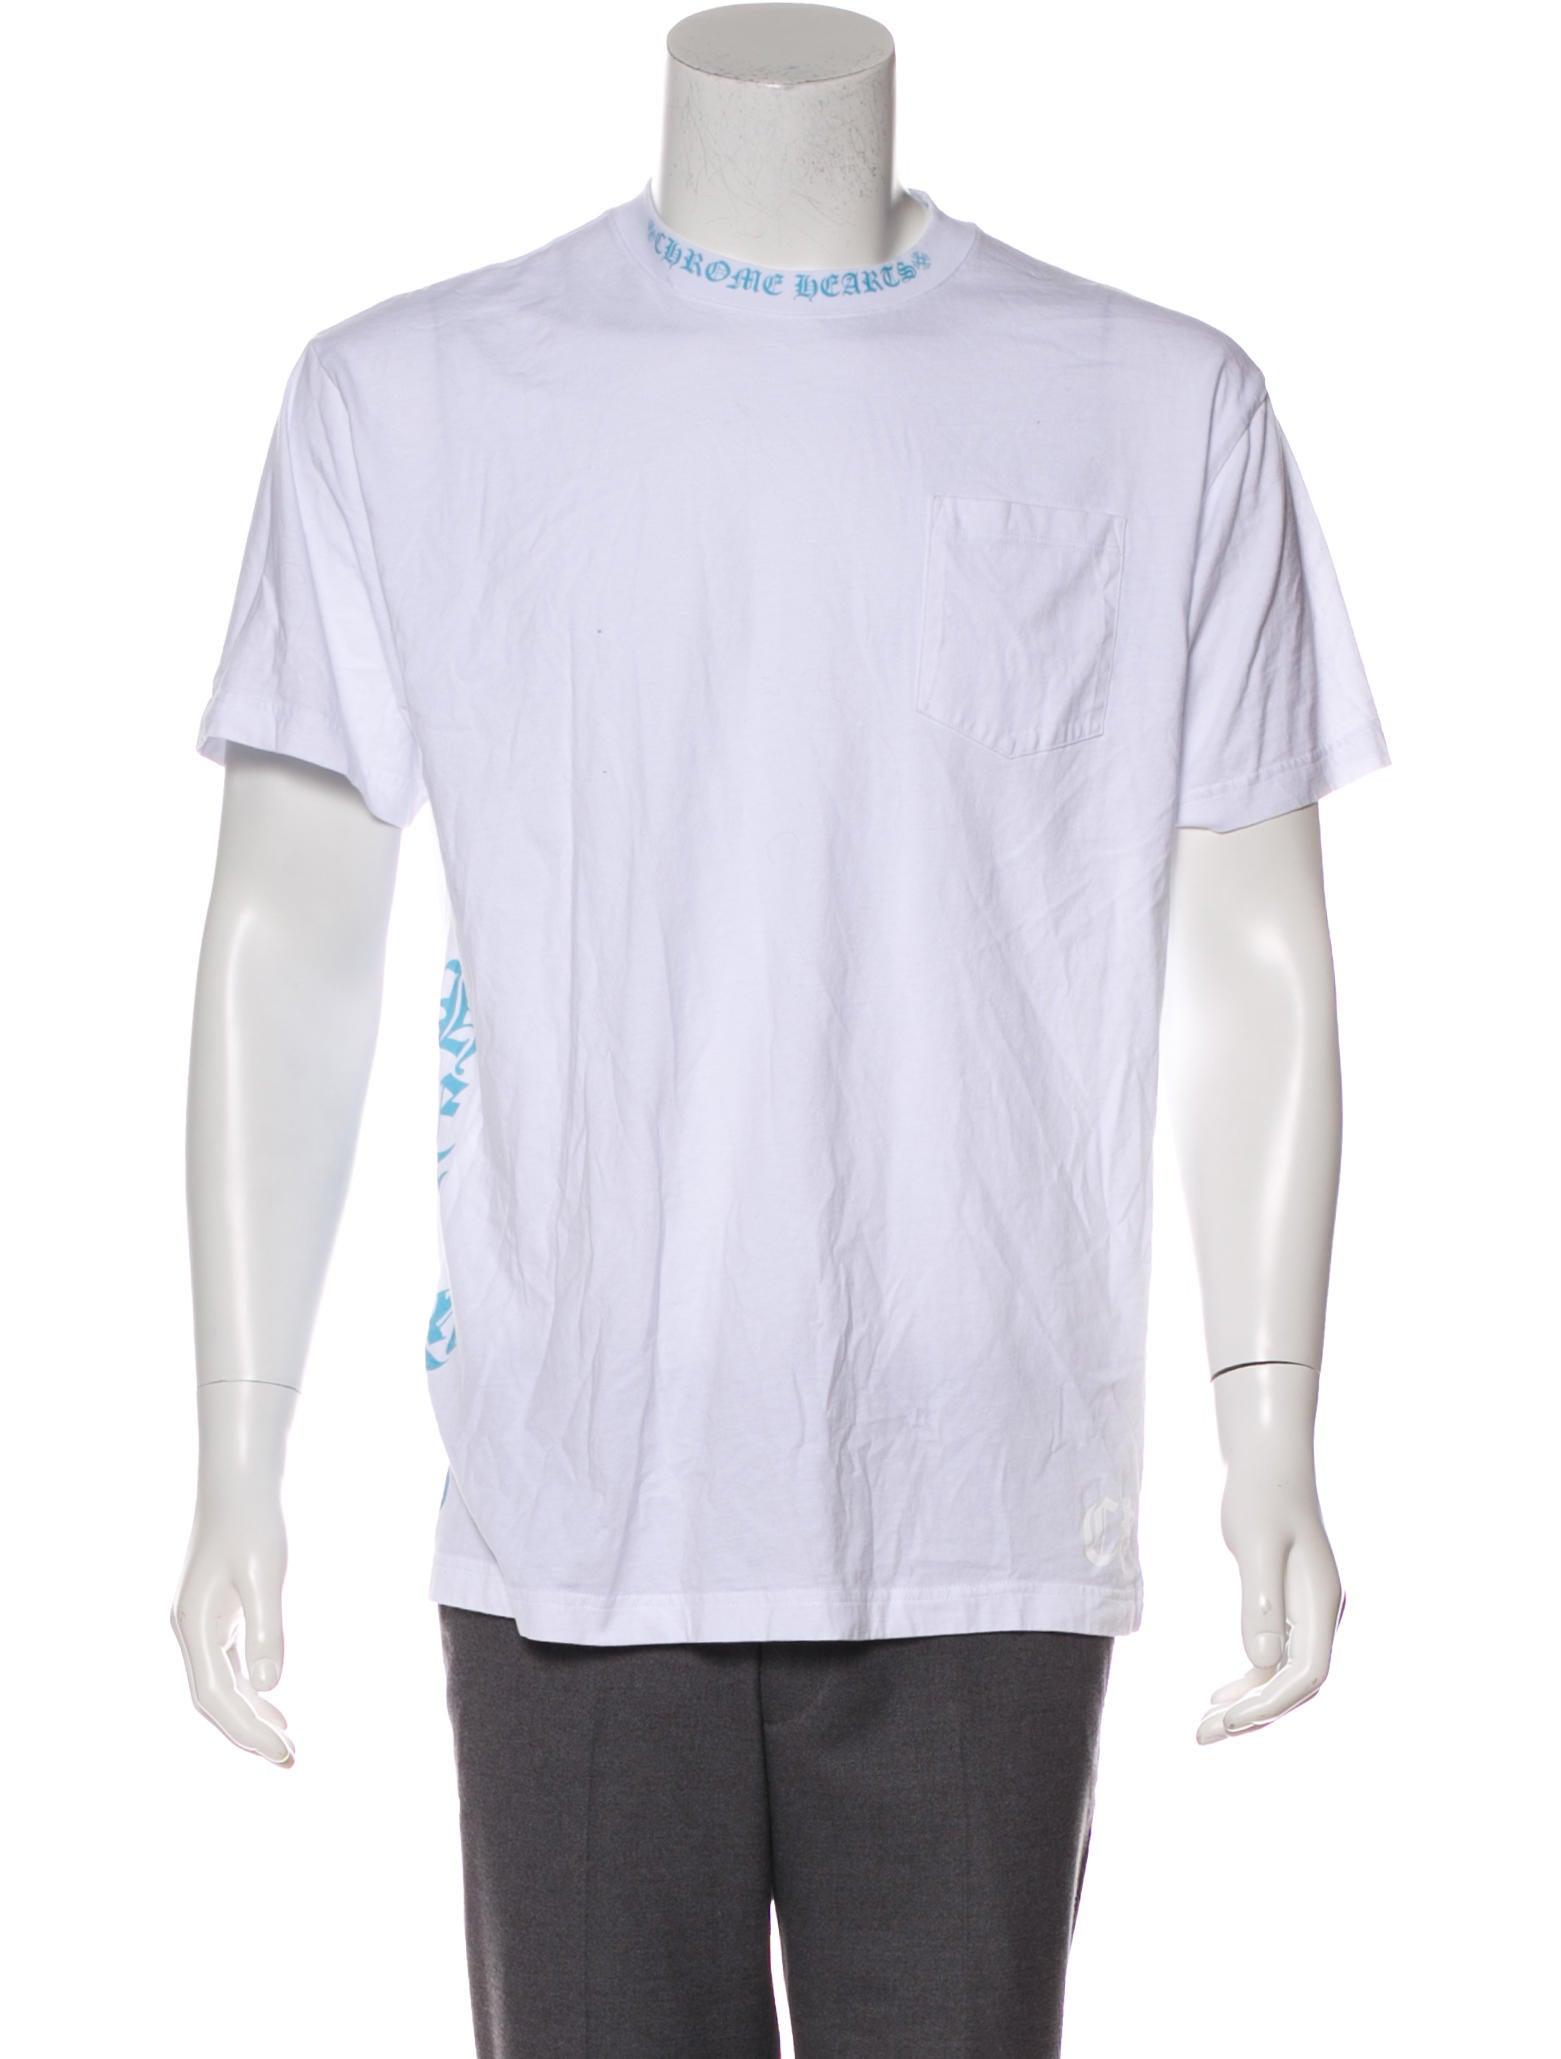 a3e6ee2b48e4 Chrome Hearts Logo Pocket T-Shirt - Clothing - CHH24448